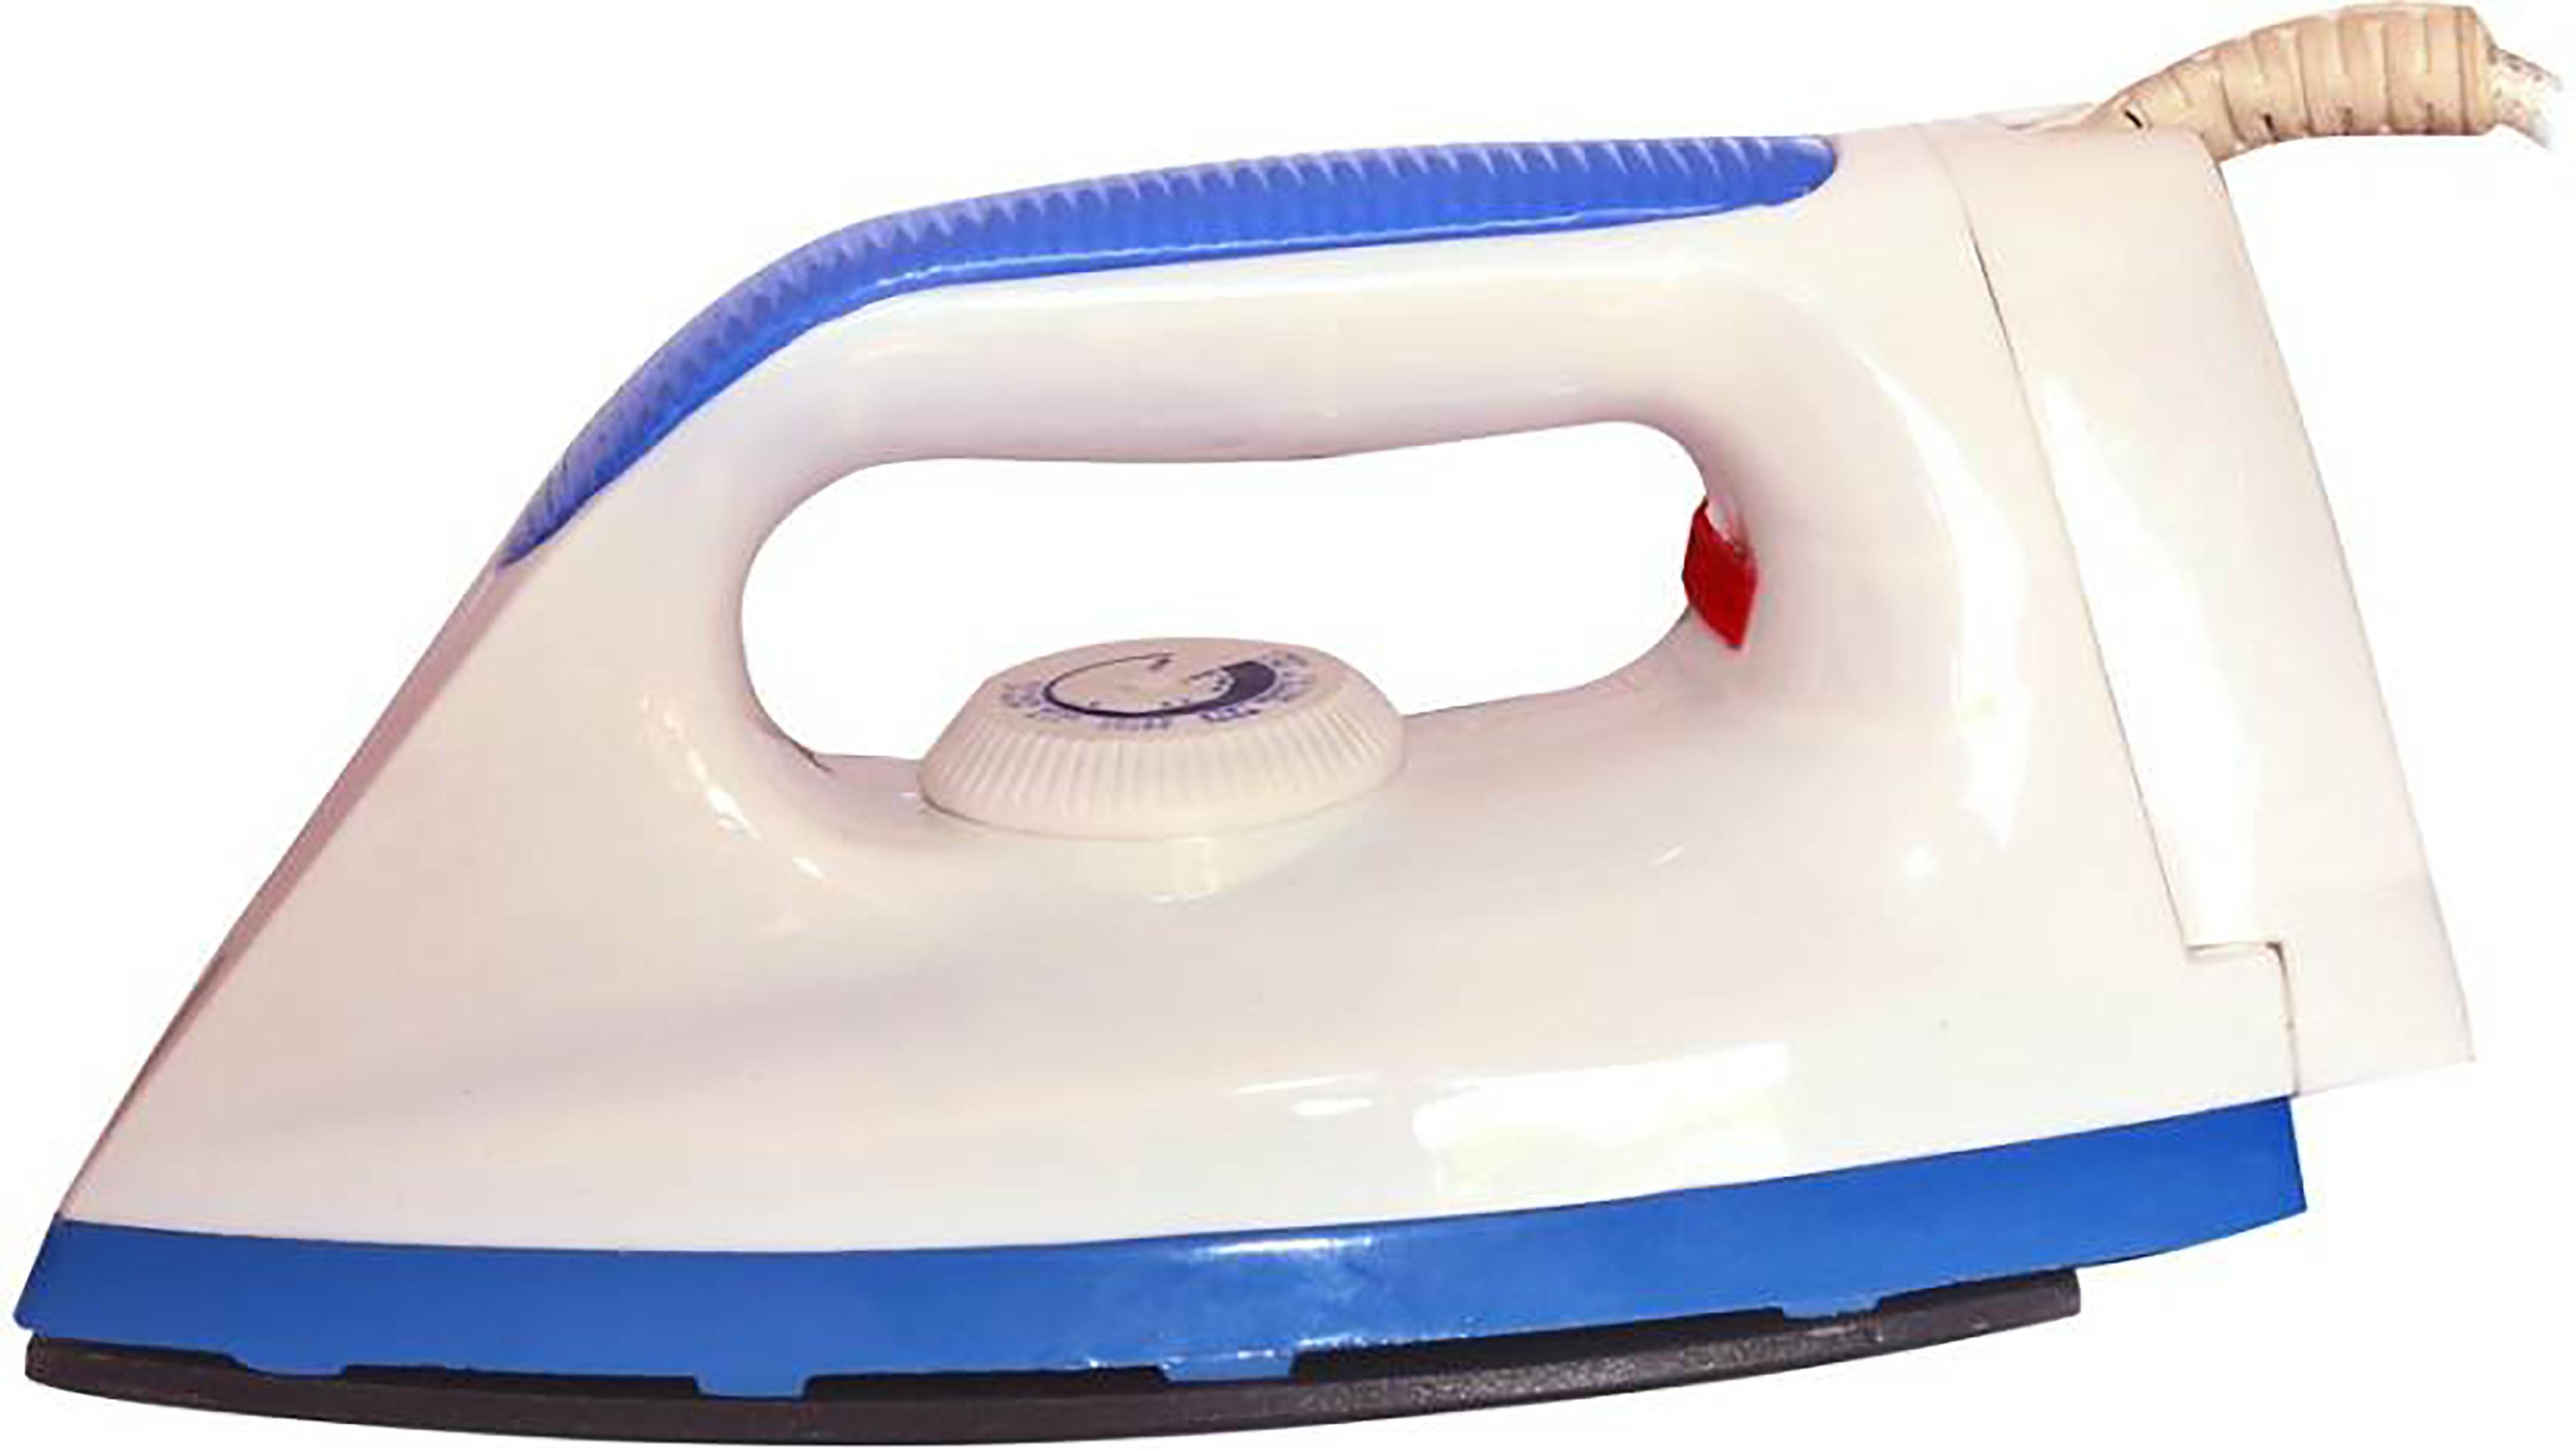 View ovista victoria750 Dry Iron(white & blue) Home Appliances Price Online(Ovista)